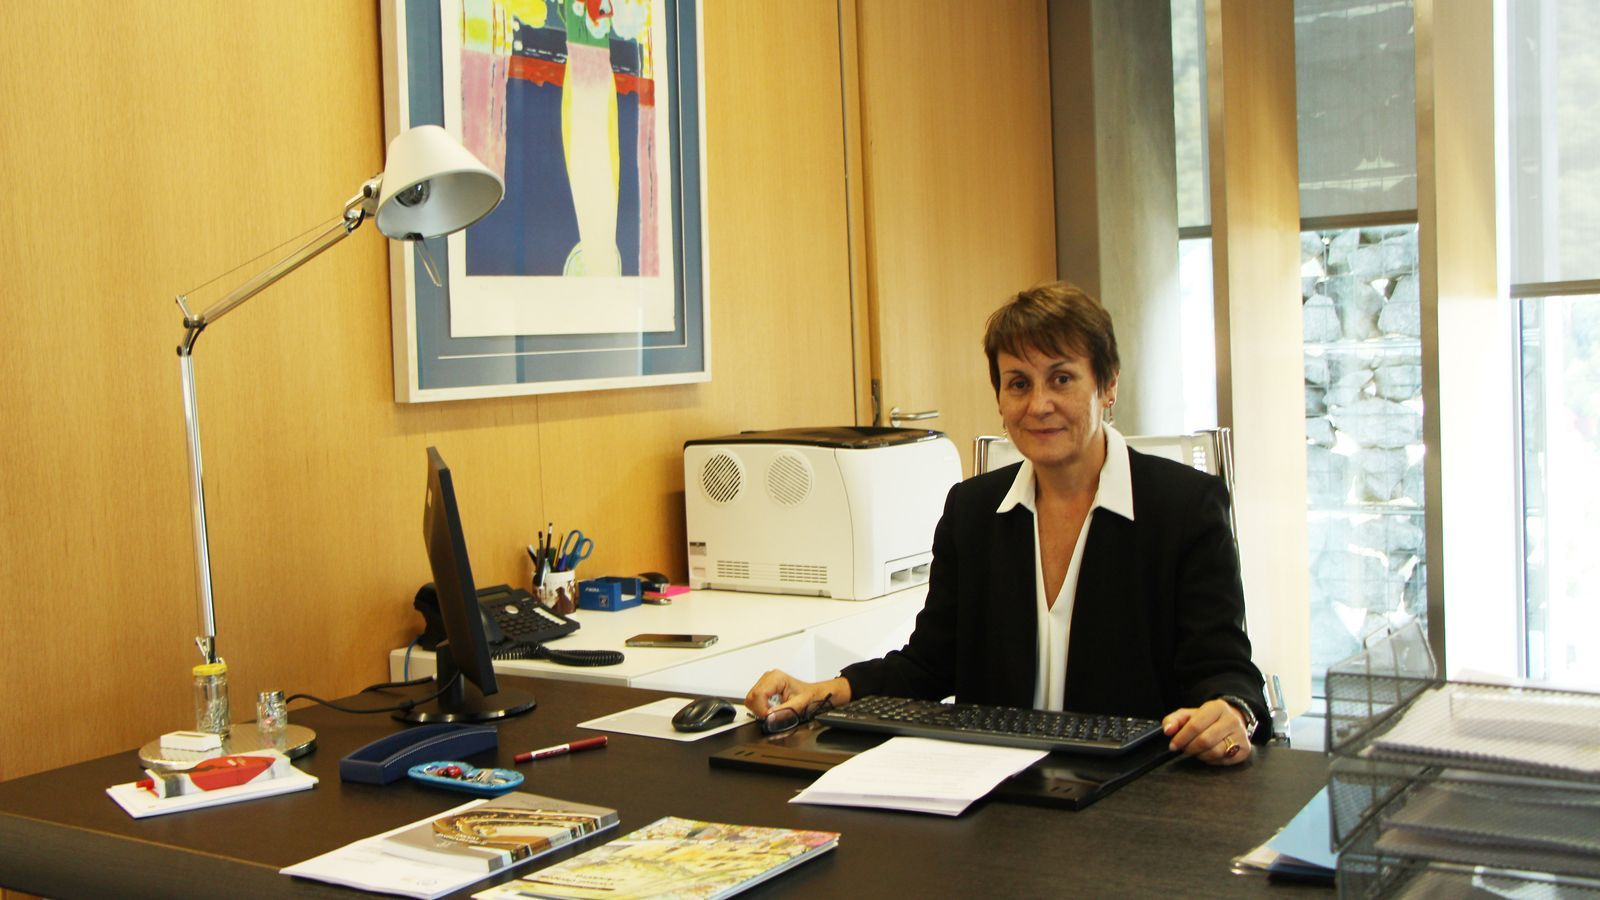 La Síndica General, Roser Suñé, en el seu despatx en el Consell General. / C. A.